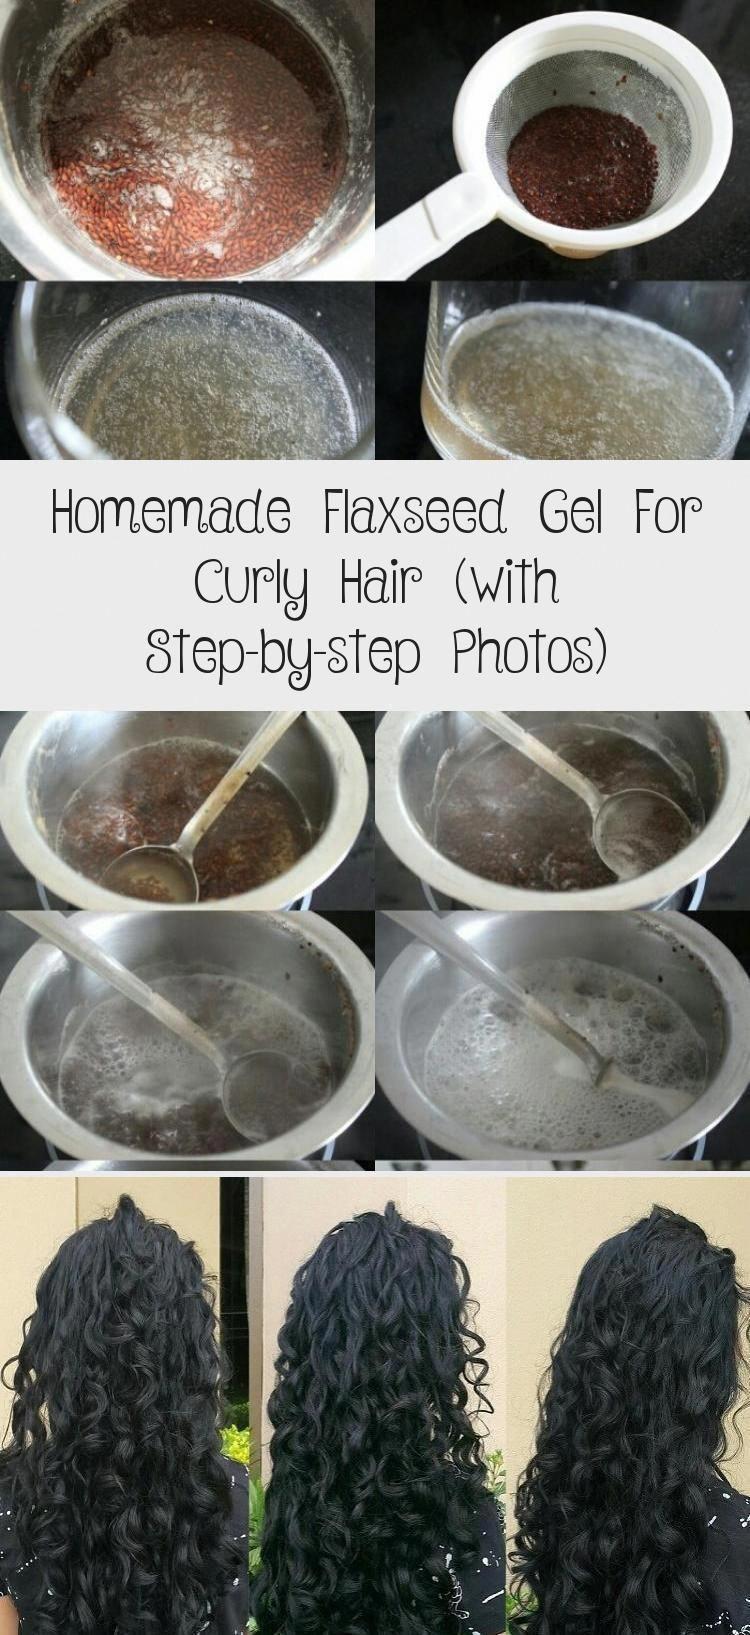 flaxseed gel curly hair (3) #curlyhairPeinados #curlyhairOmbre #Loosecurlyhair # ...#curly #curlyhairombre #curlyhairpeinados #flaxseed #gel #hair #loosecurlyhair #HealthWellnessNutrition